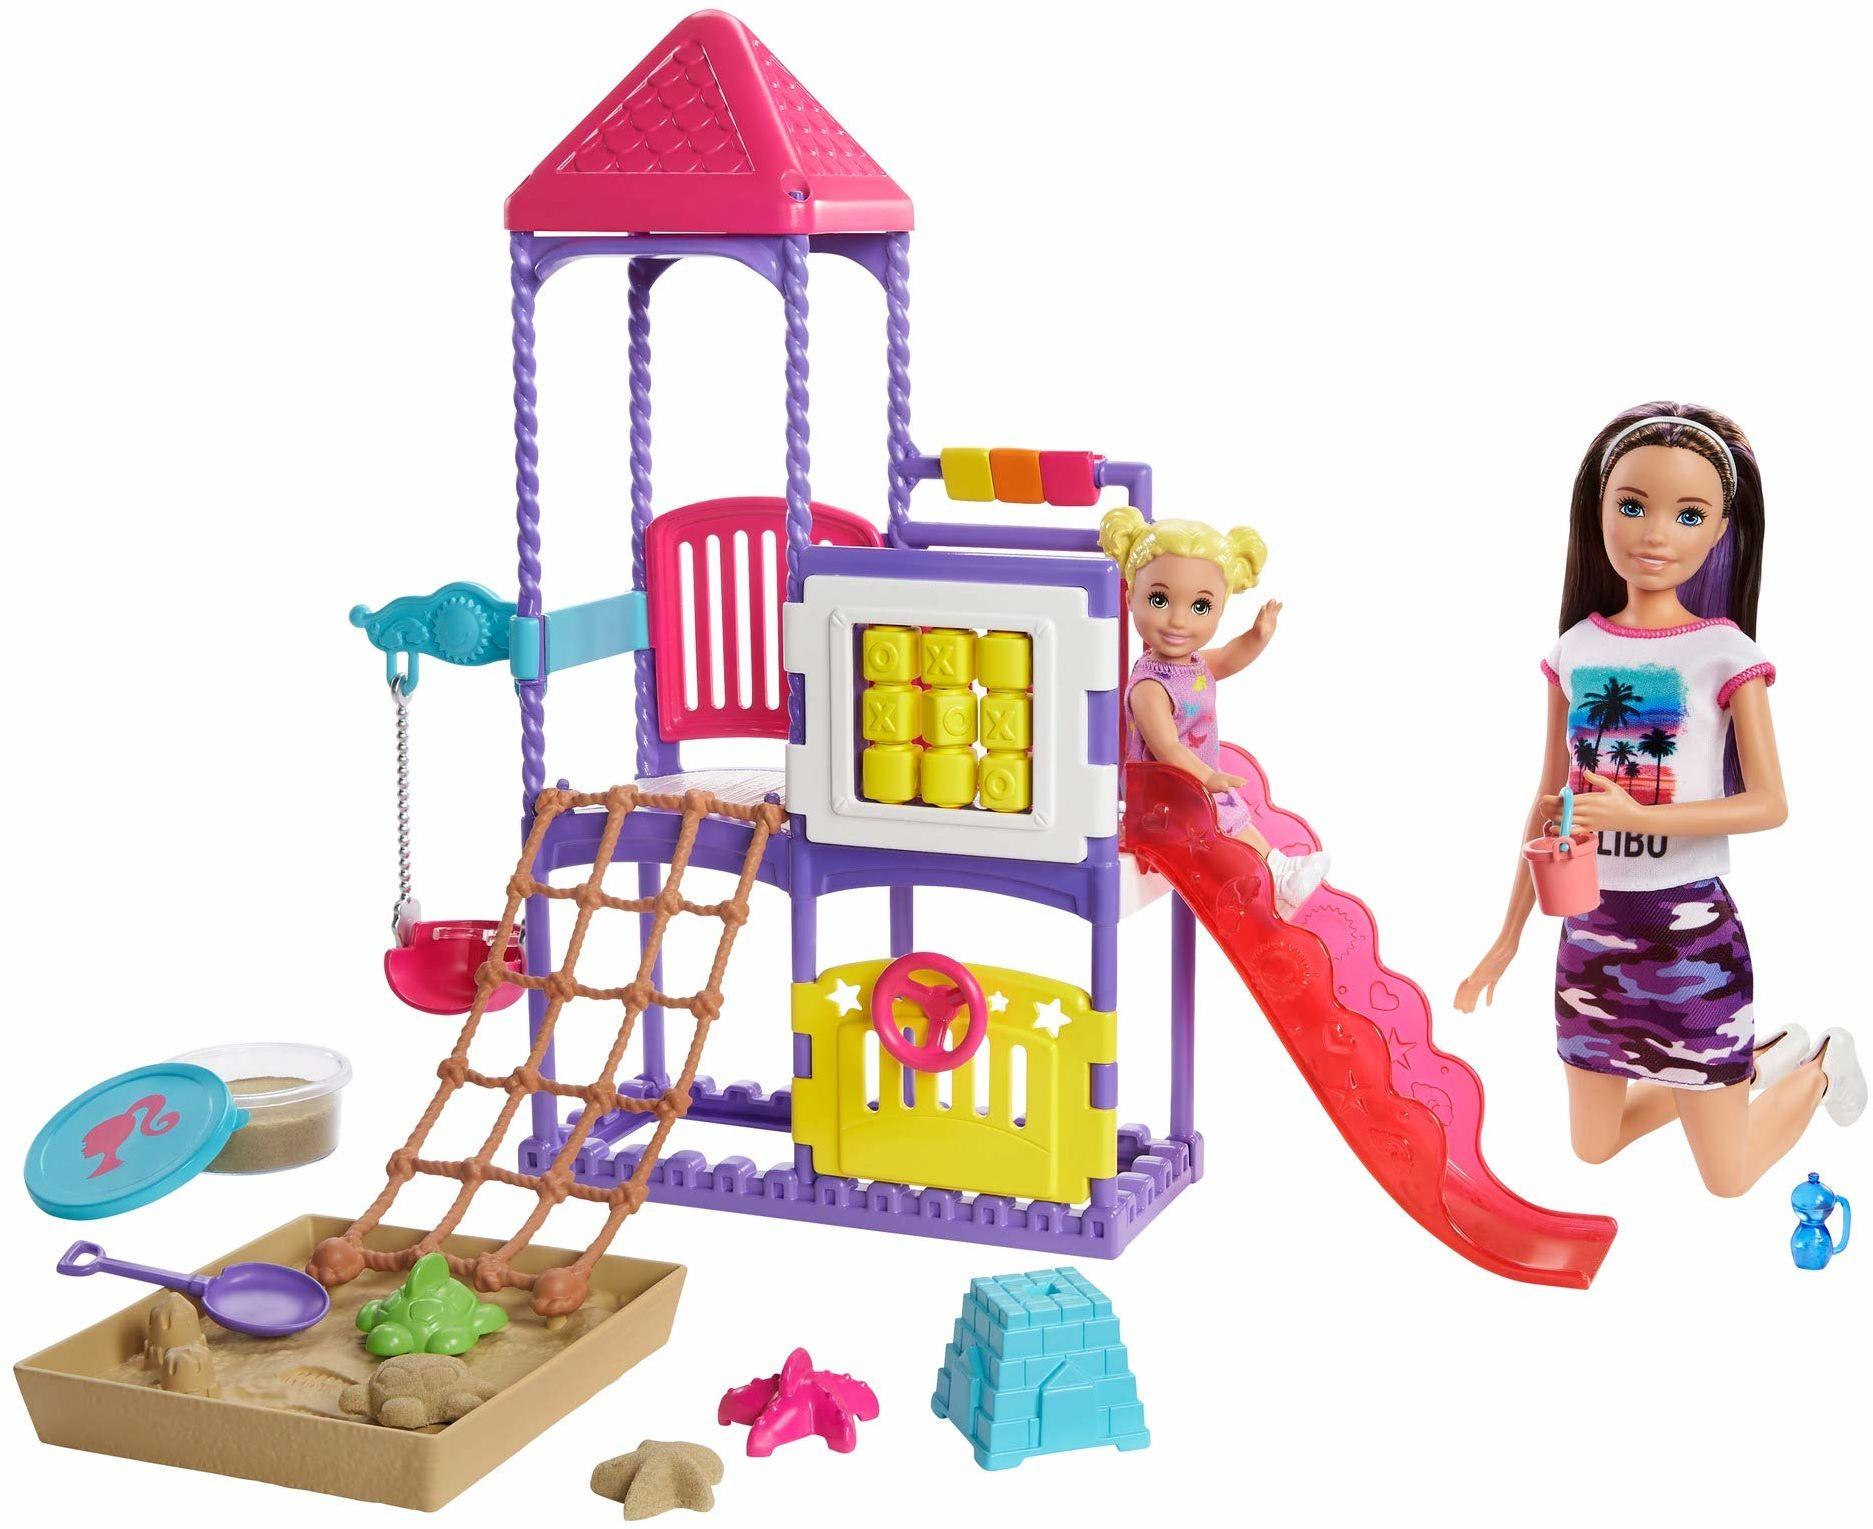 Barbie GHV89 Skipper Babysitters Inc Climb ''n Explore lalki i zestaw do zabawy